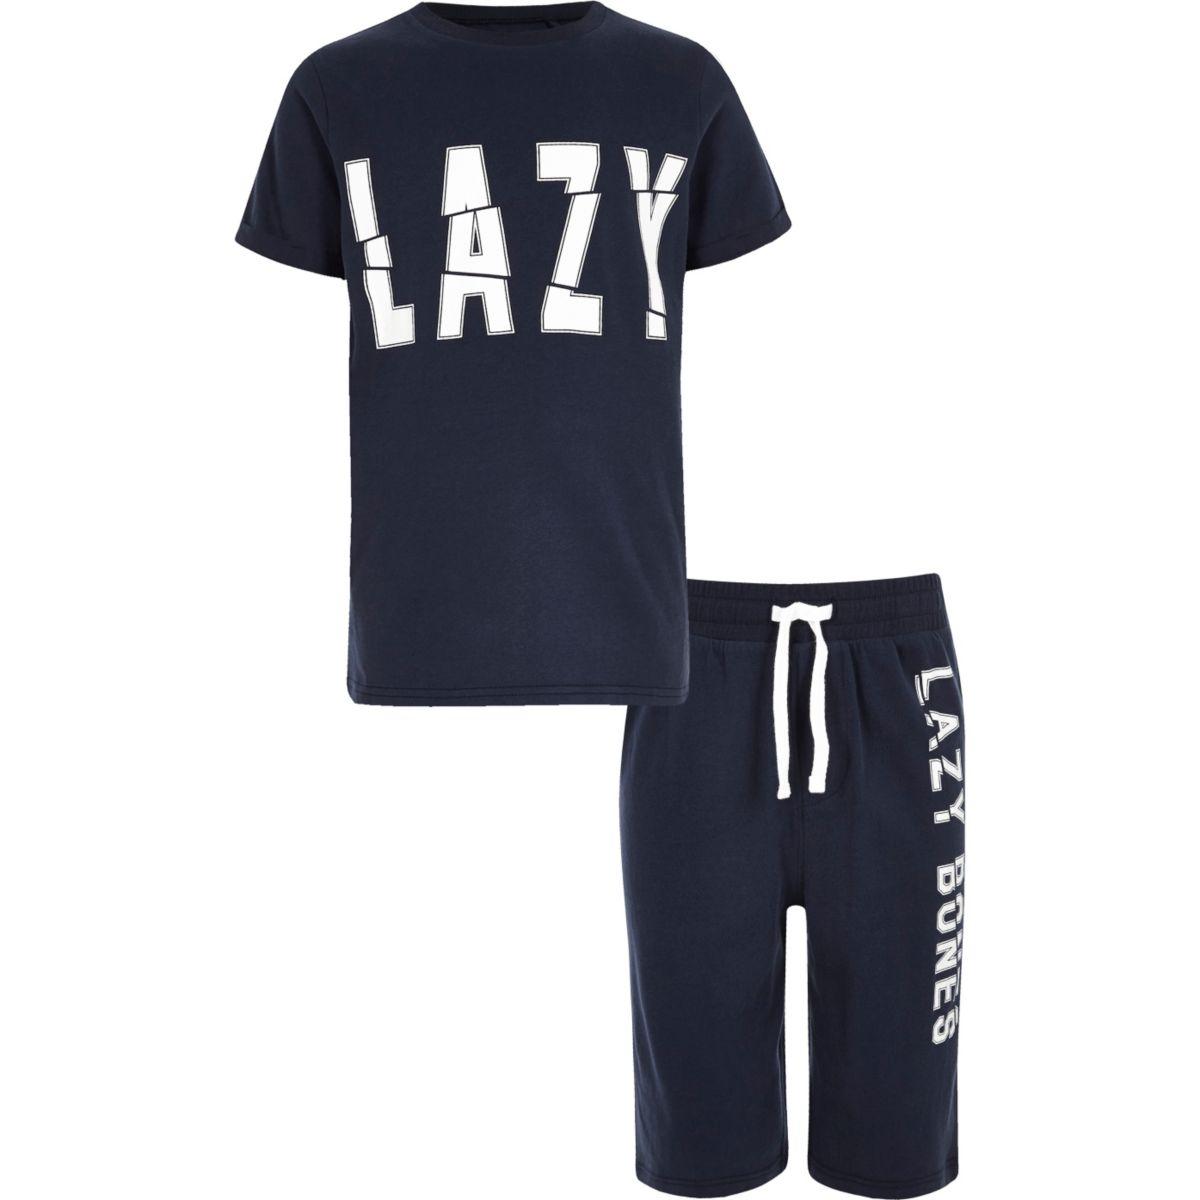 Boys navy 'lazy bones' pajama set